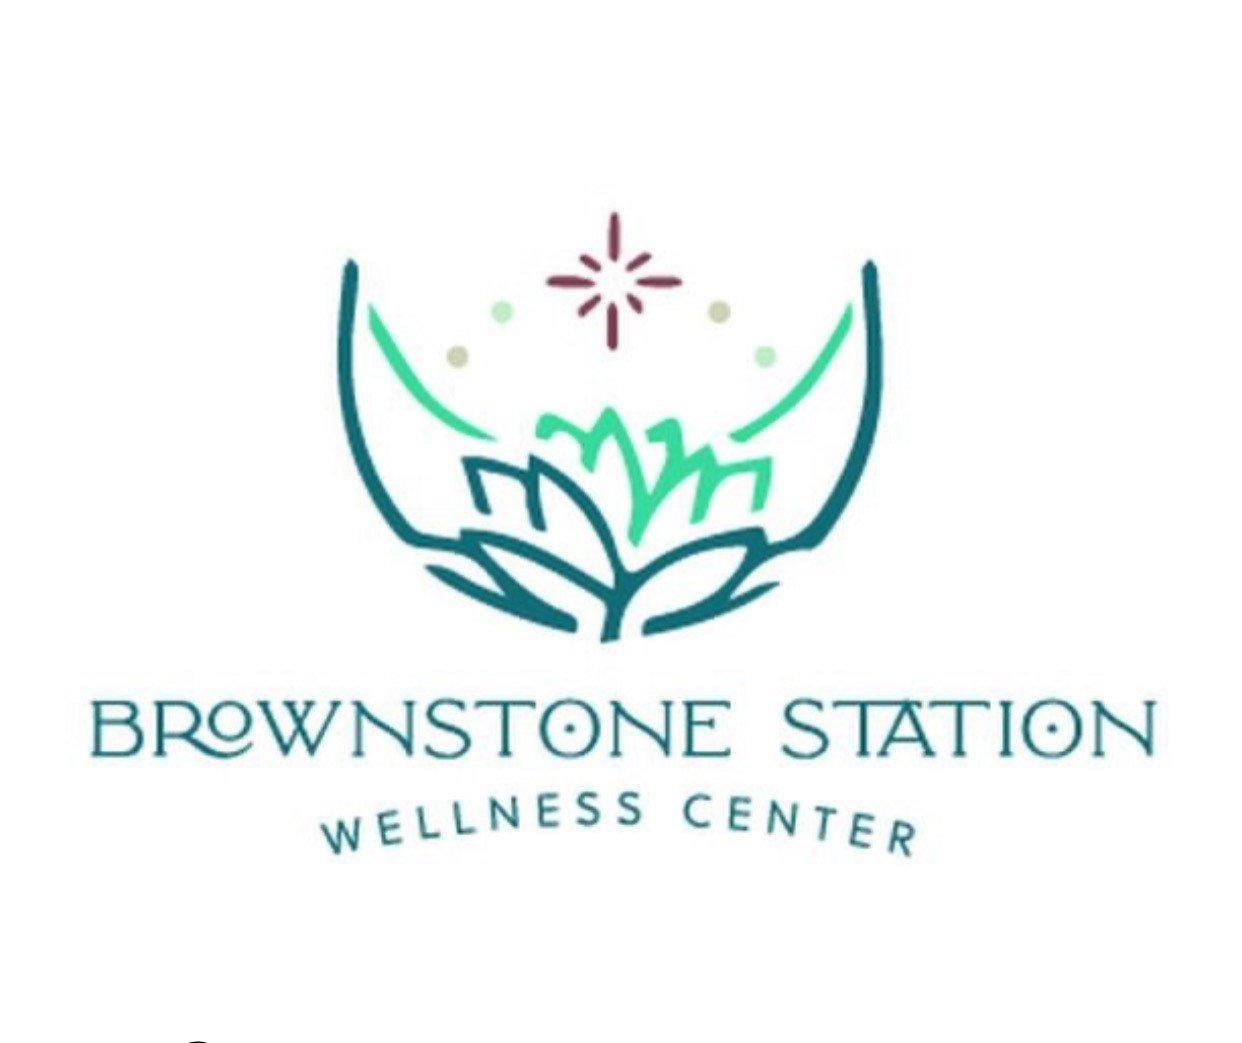 Brownstone station